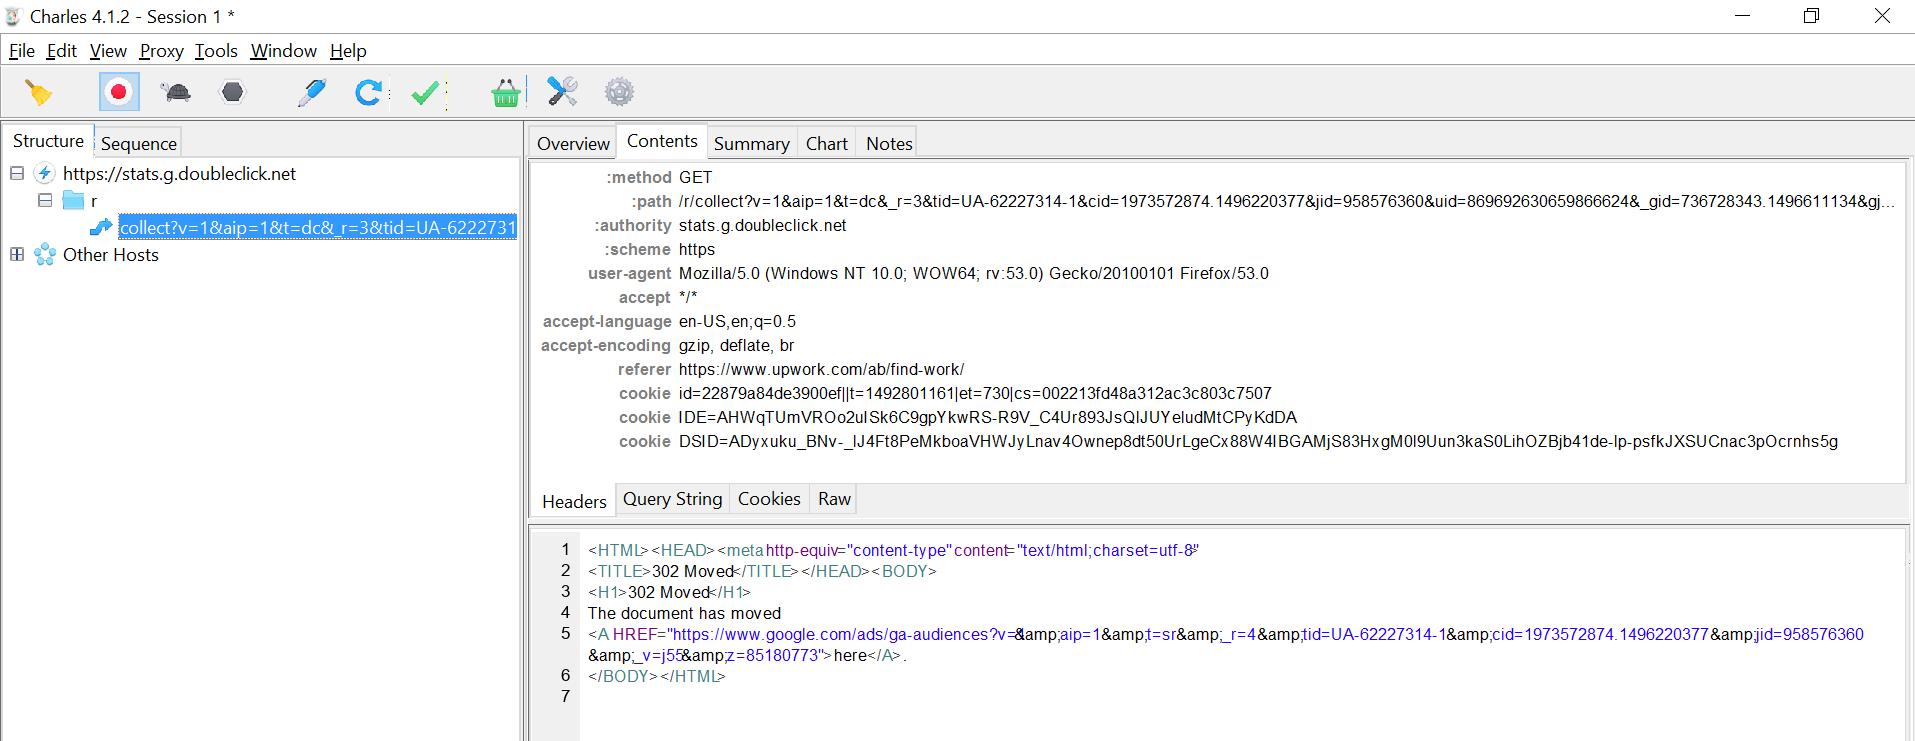 Software Testing Article Charles Debugging Proxy Application